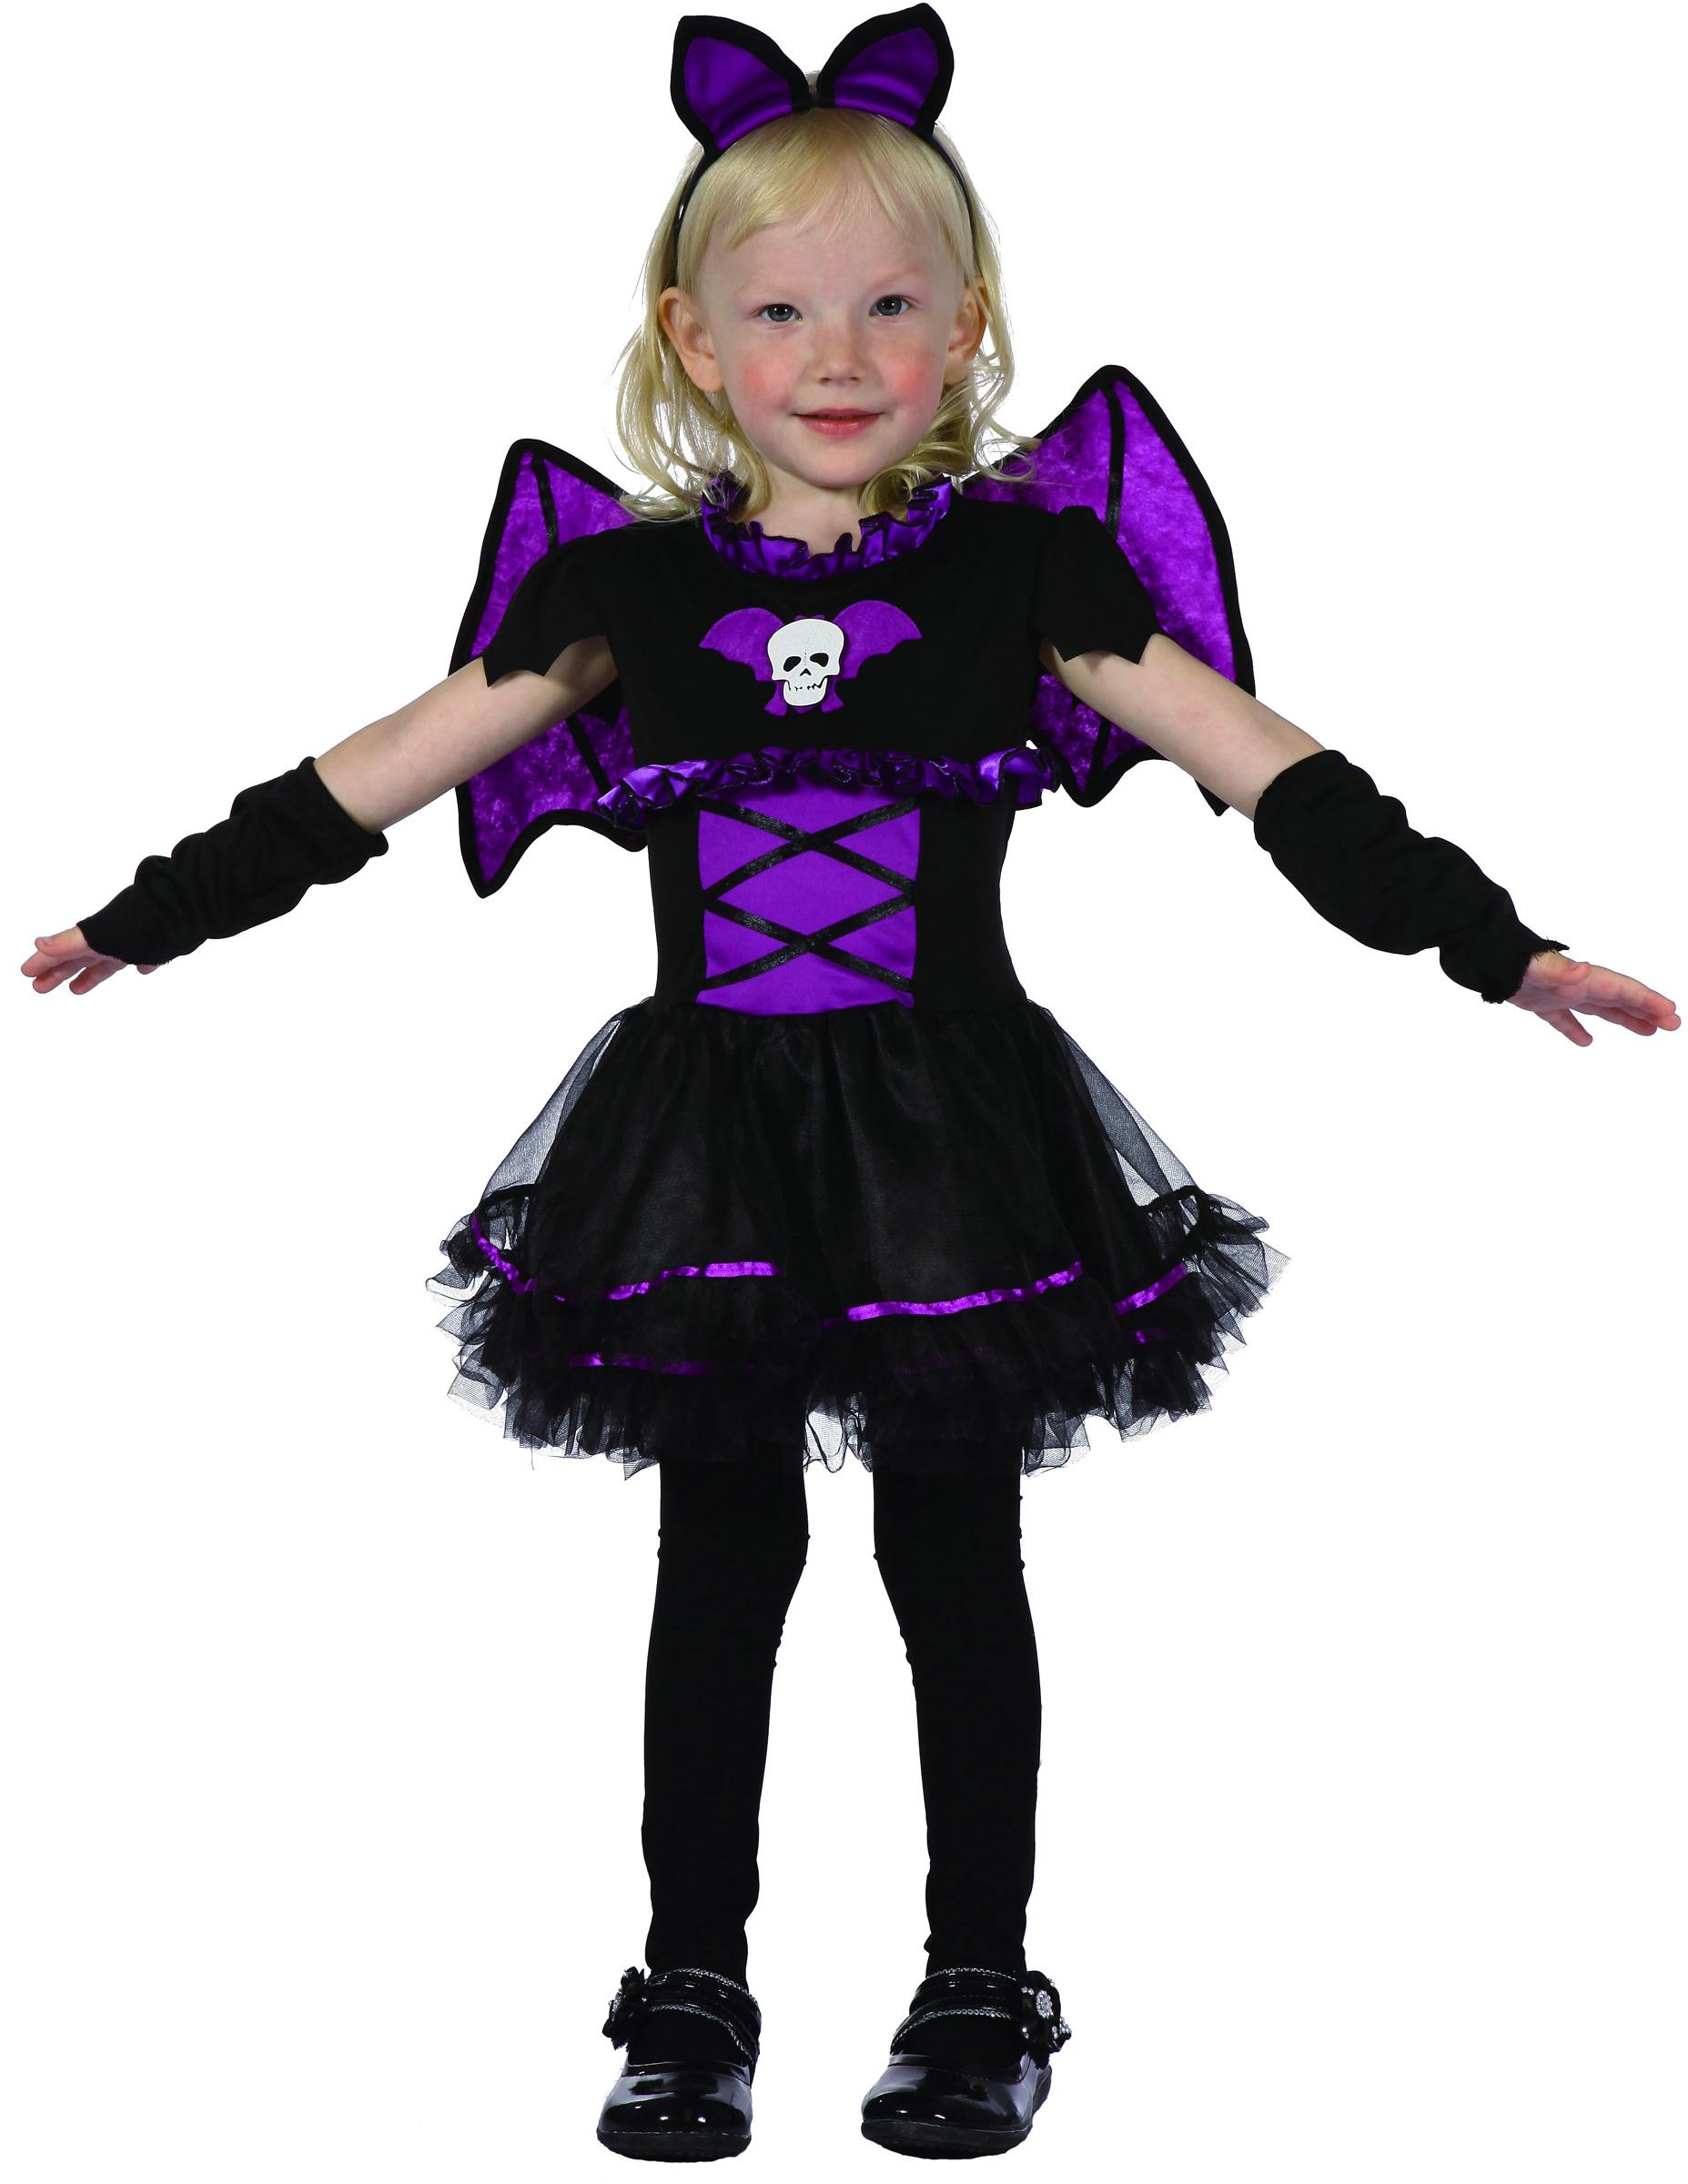 travestimento pipistrello neonata halloween. Black Bedroom Furniture Sets. Home Design Ideas